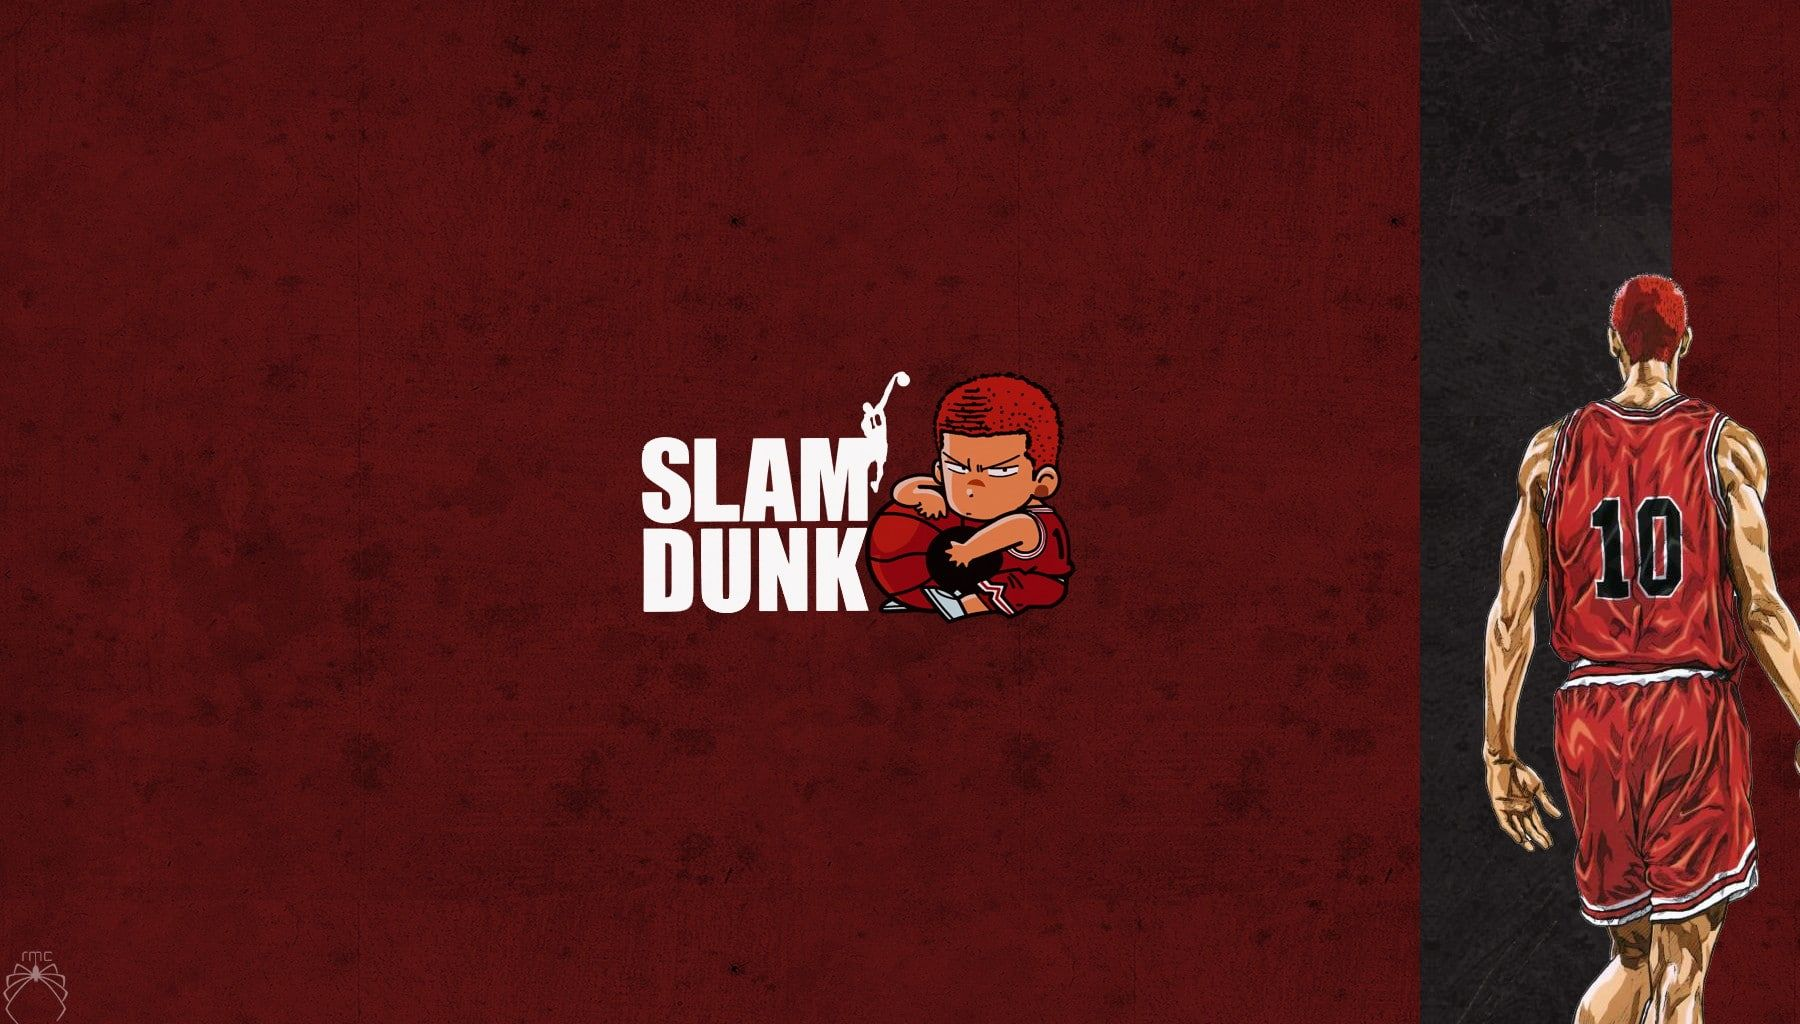 Slam Dunk Shohoku High Anime Sakuragi Hanamichi 720p Wallpaper Hdwallpaper Desktop Anime Wallpaper Slam Dunk Anime Slam Dunk